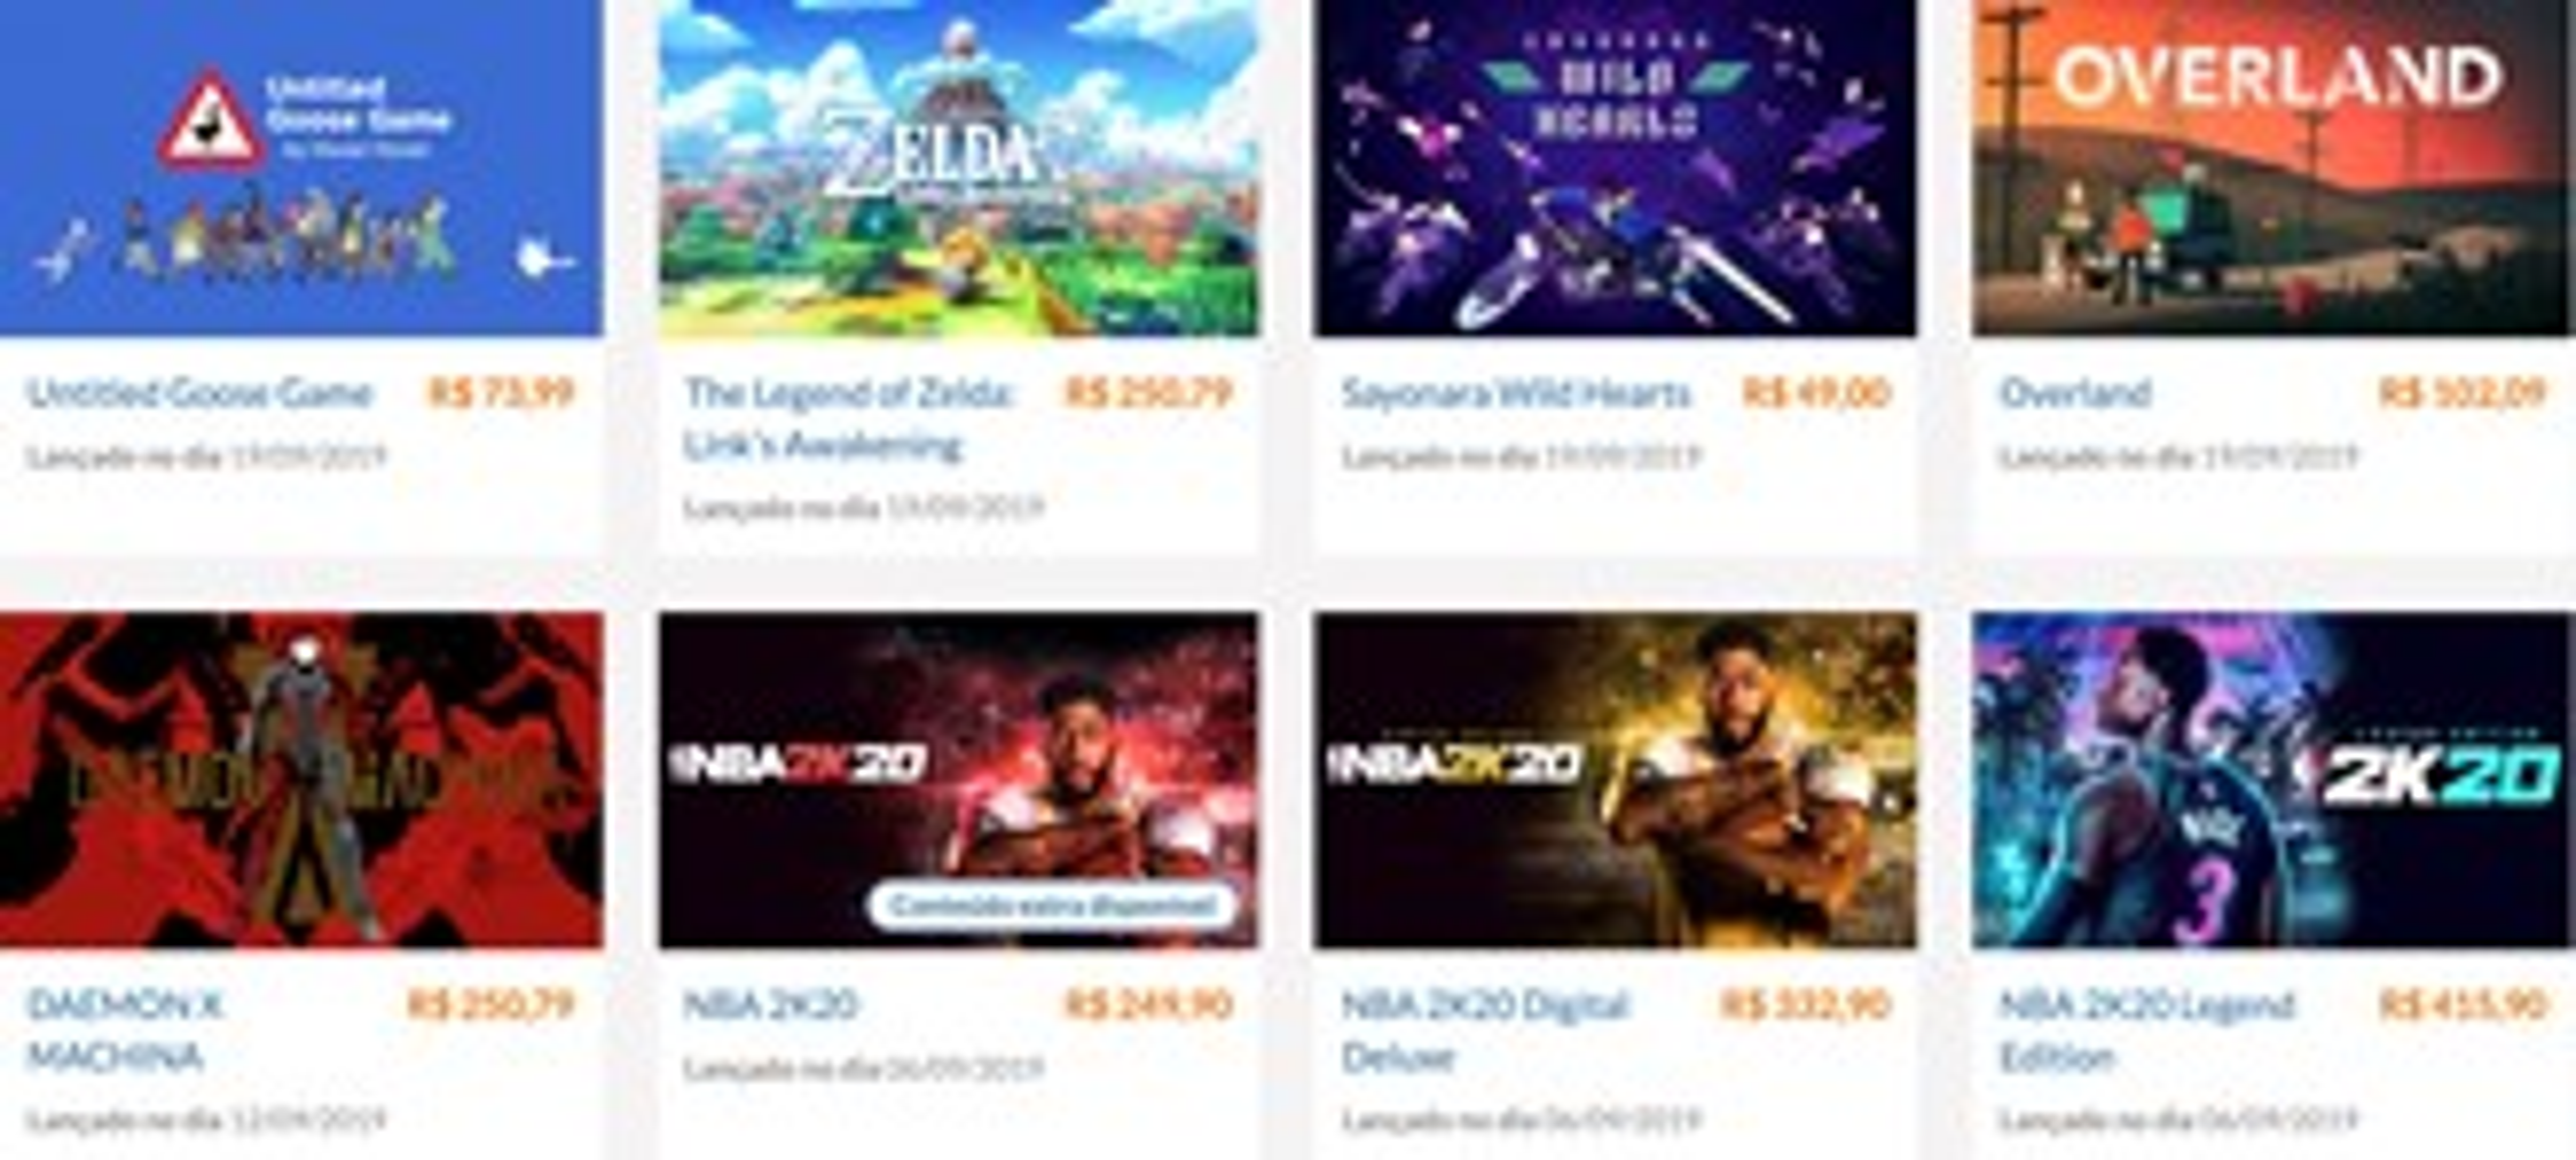 Nintendo games online store in Brazil.